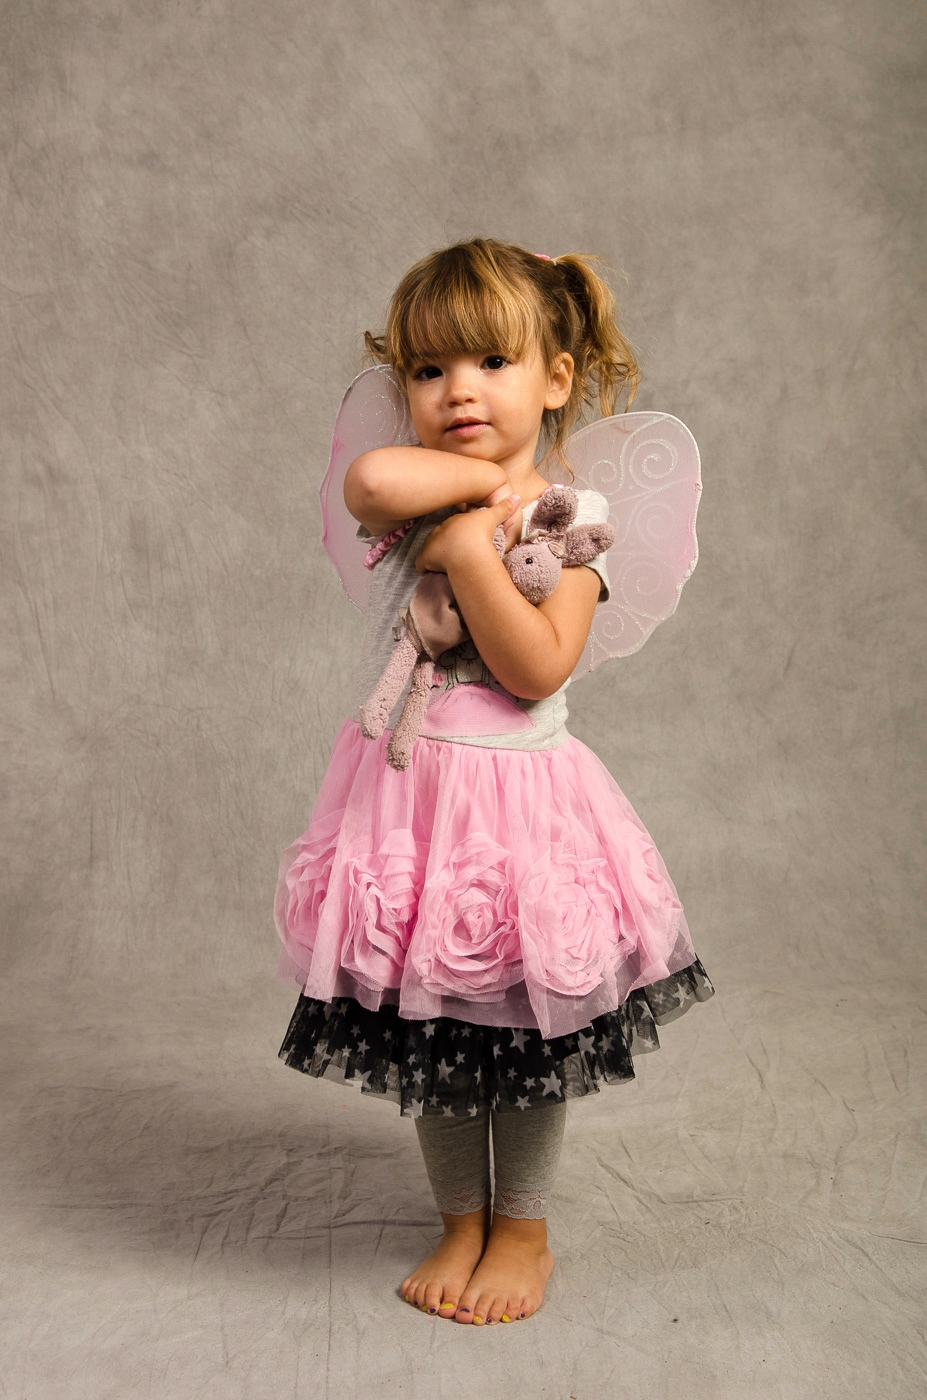 Baby studio portrait photography - Brooklyn